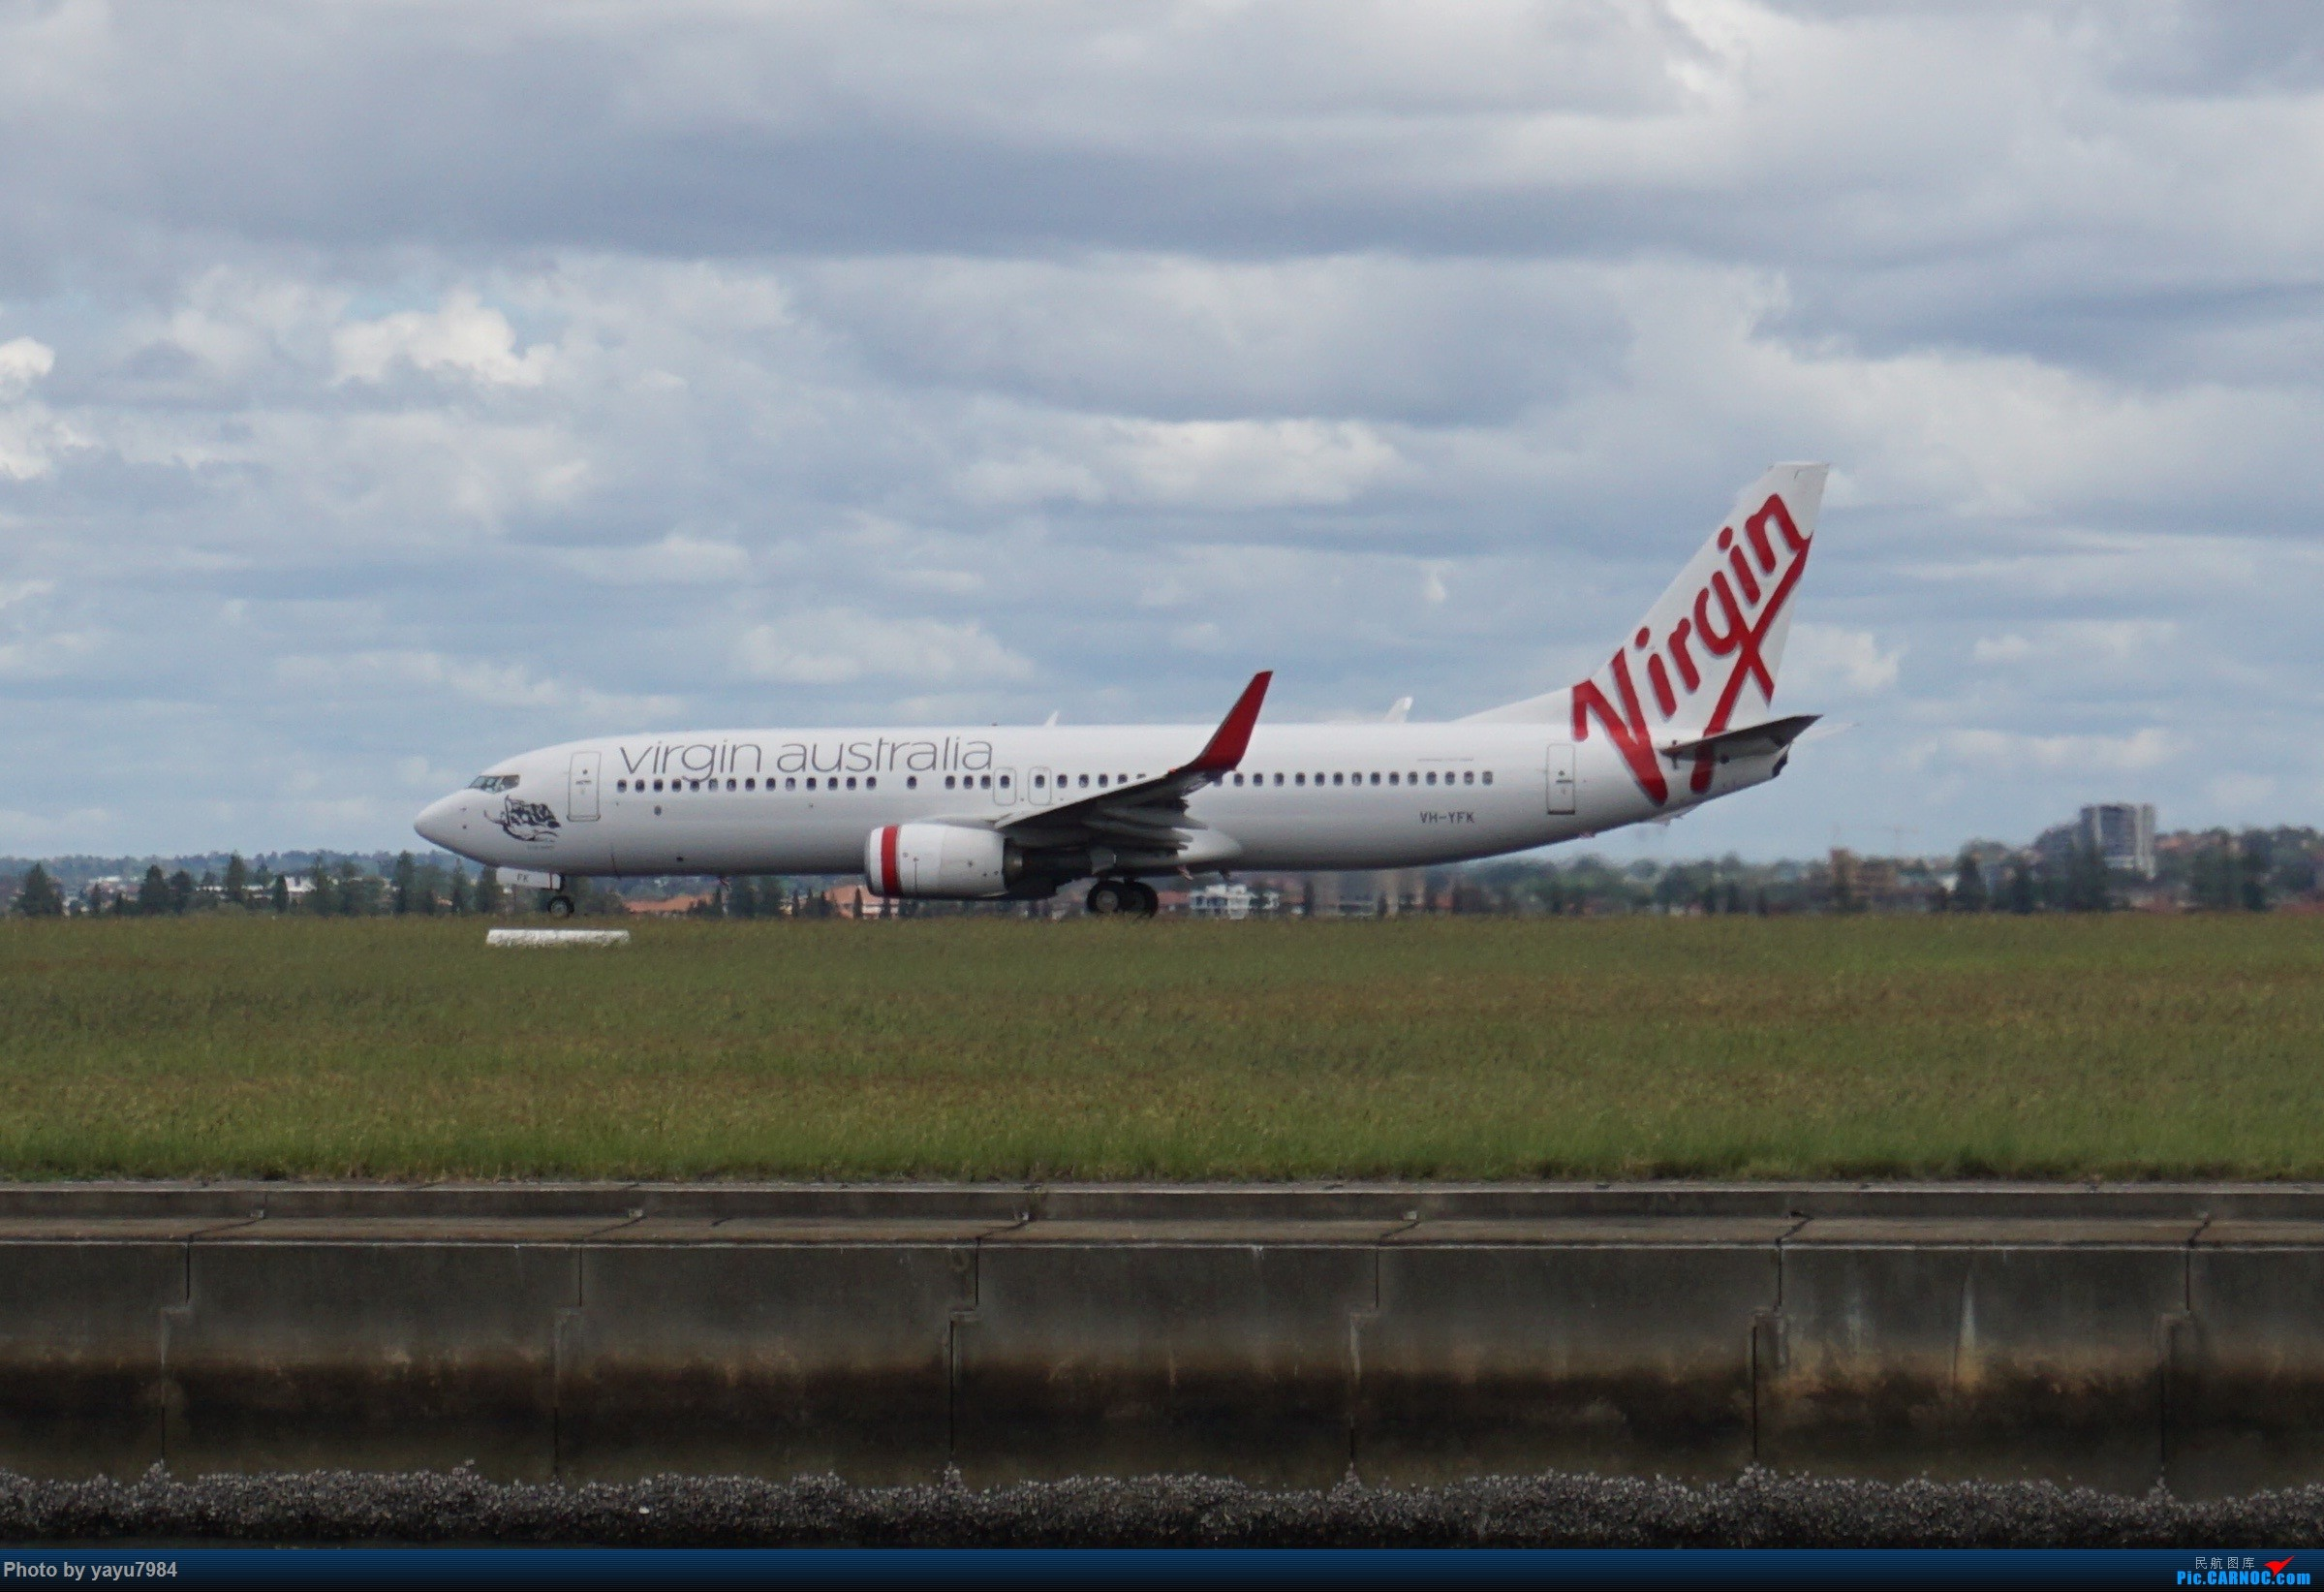 Re:[原创][SYD] 开帖分享一下16L/34R,以及07/25跑道周边的新拍机点位 BOEING 737-800 VH-YFK 澳大利亚悉尼金斯福德·史密斯机场